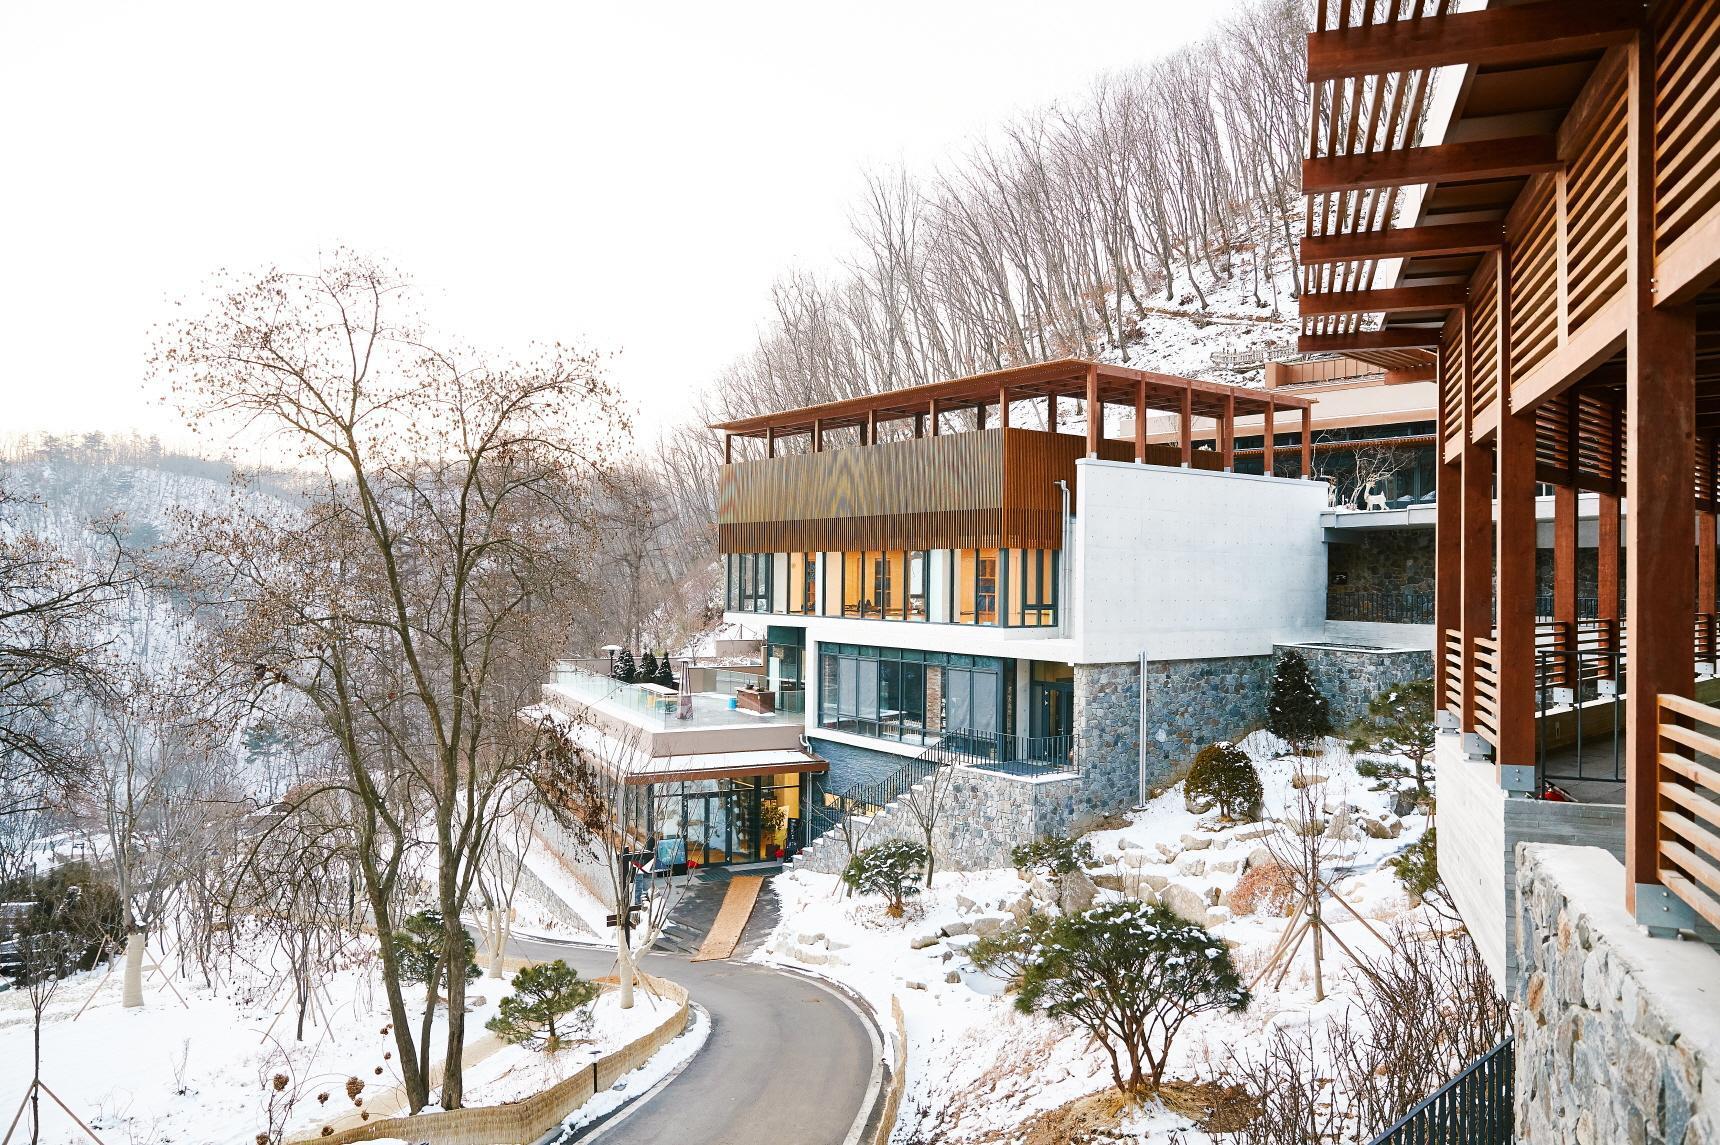 Healience Seon Maeul Healing Resort